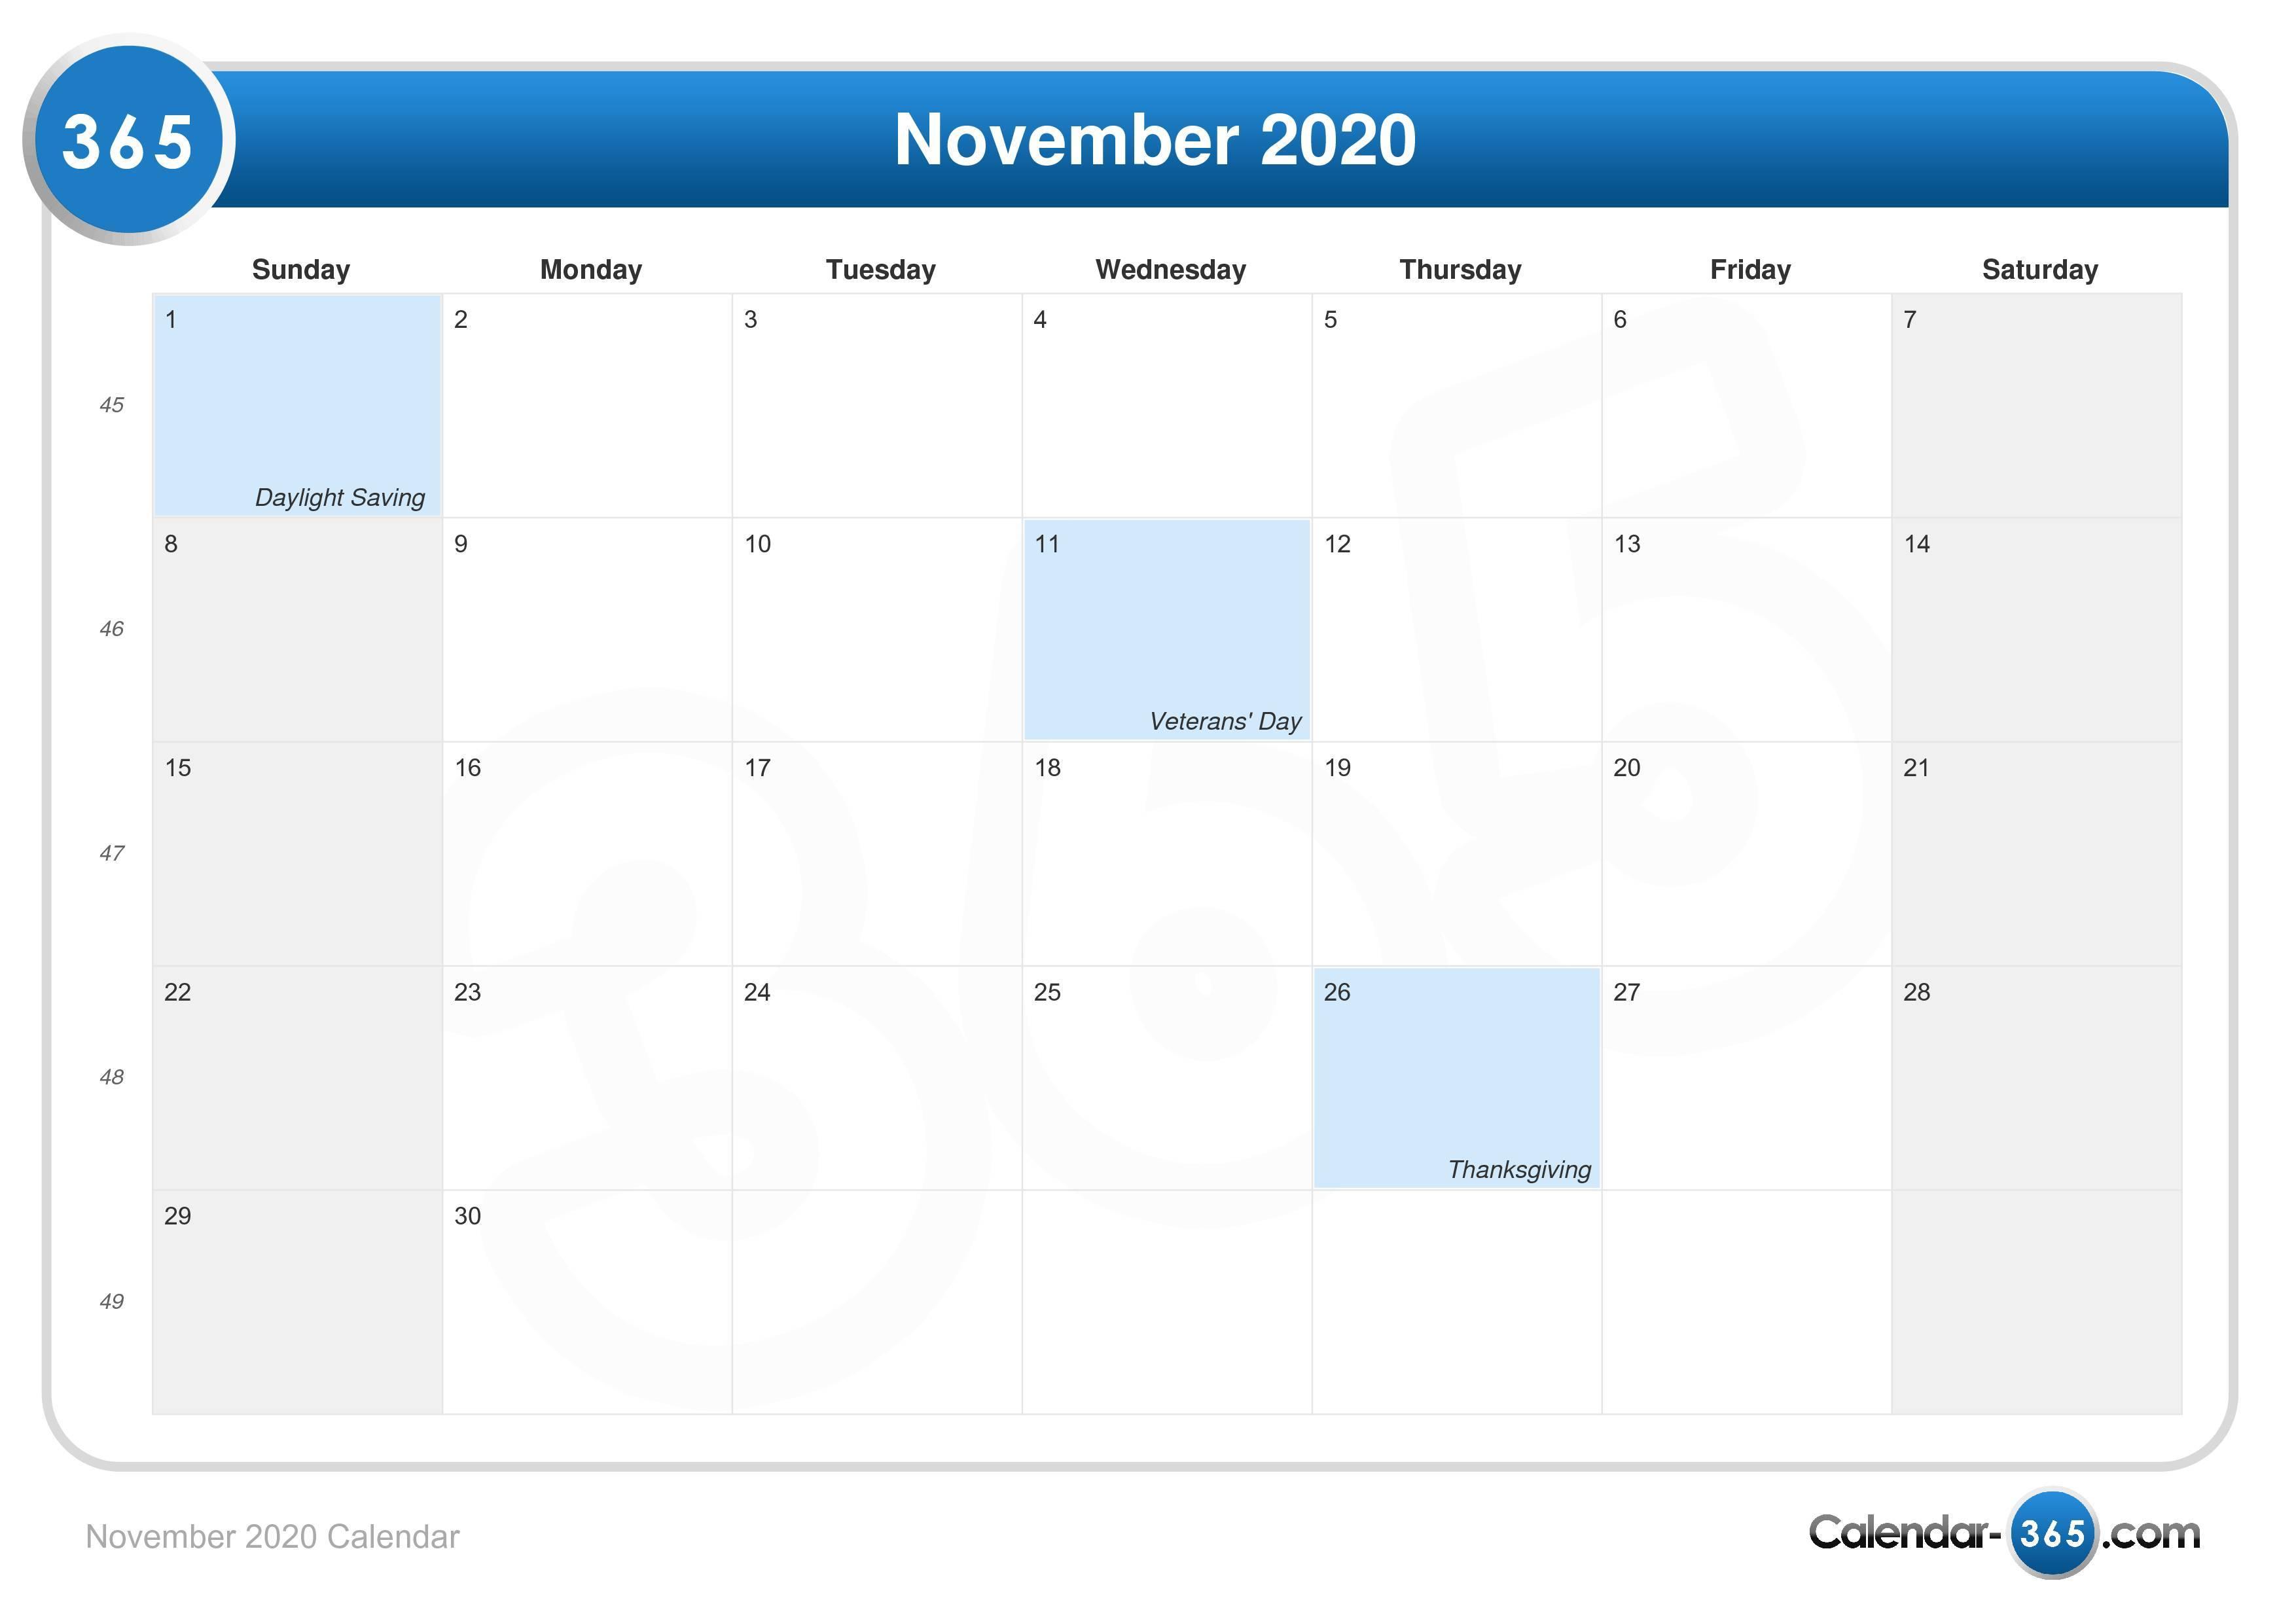 November 2020 Calendar for Uc Berkeley Calendar 2020-2020